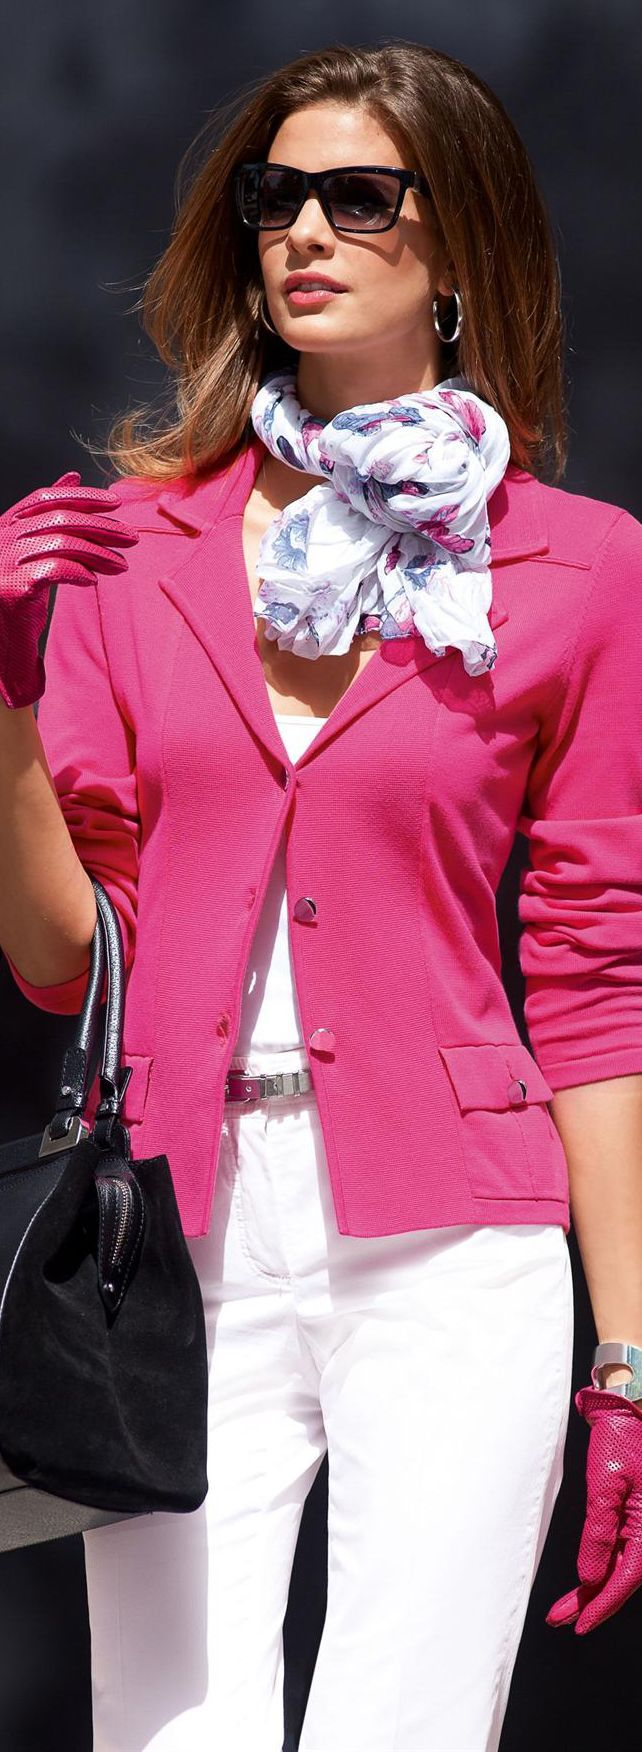 Mix fashionable dresses | Fashion Beauty MIX